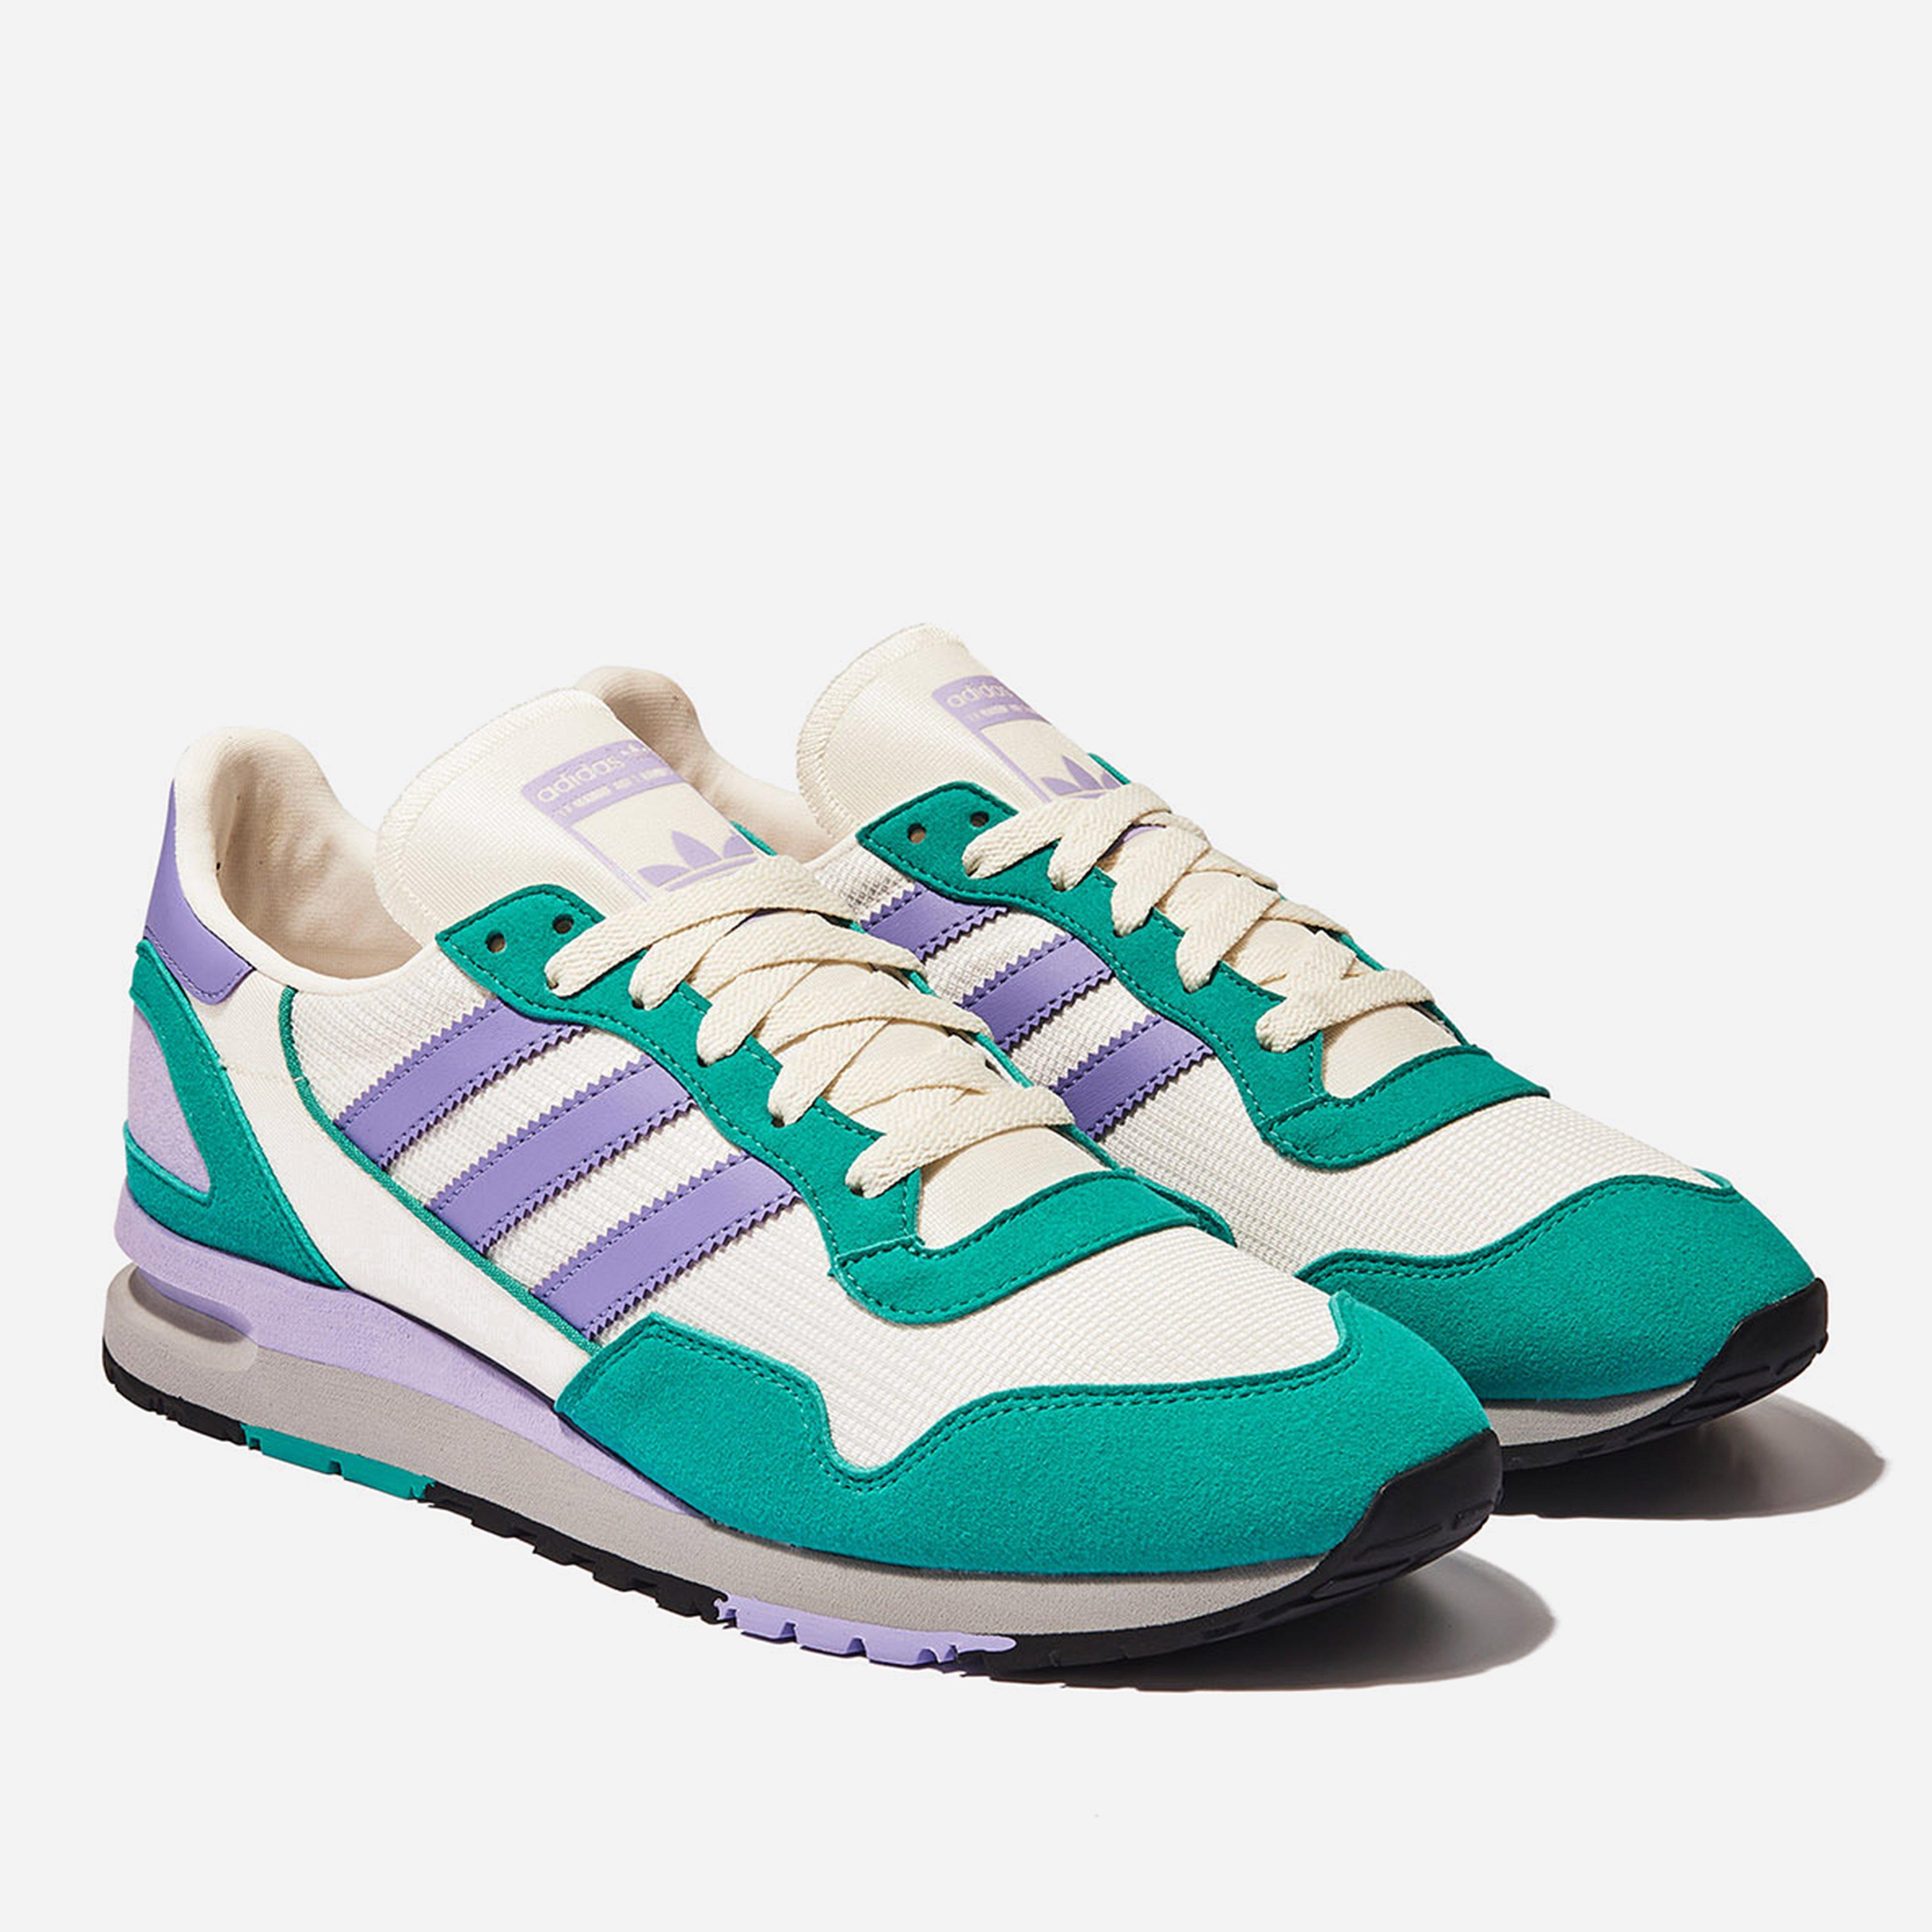 1852235cf648 Lyst - adidas Originals Adidas Originals Lowertree Spzl in Green for Men